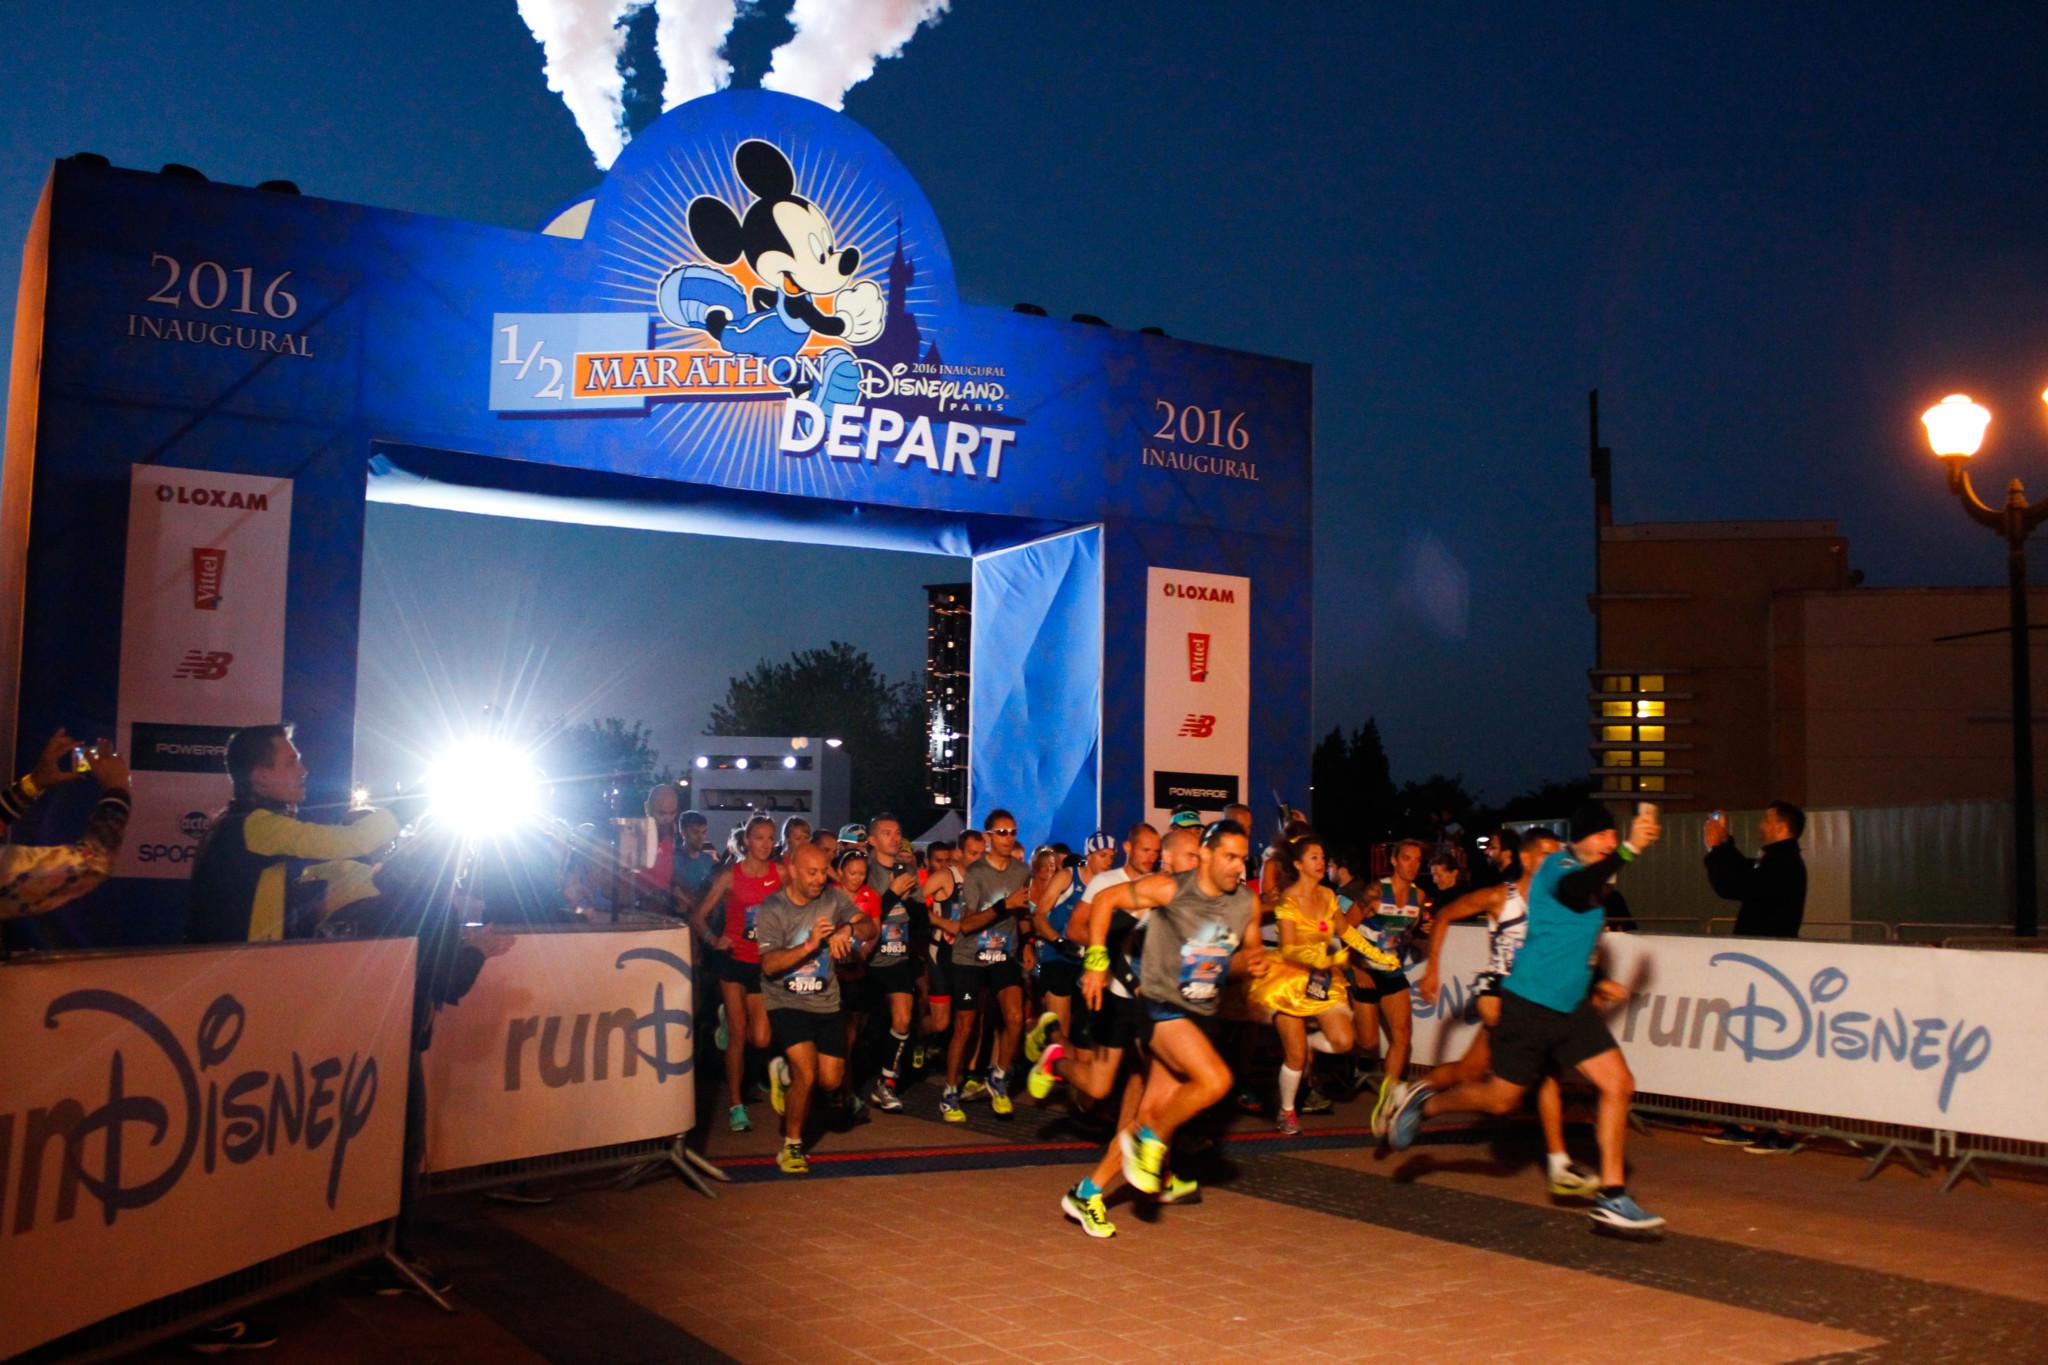 Half Marathon Run Disney 2016